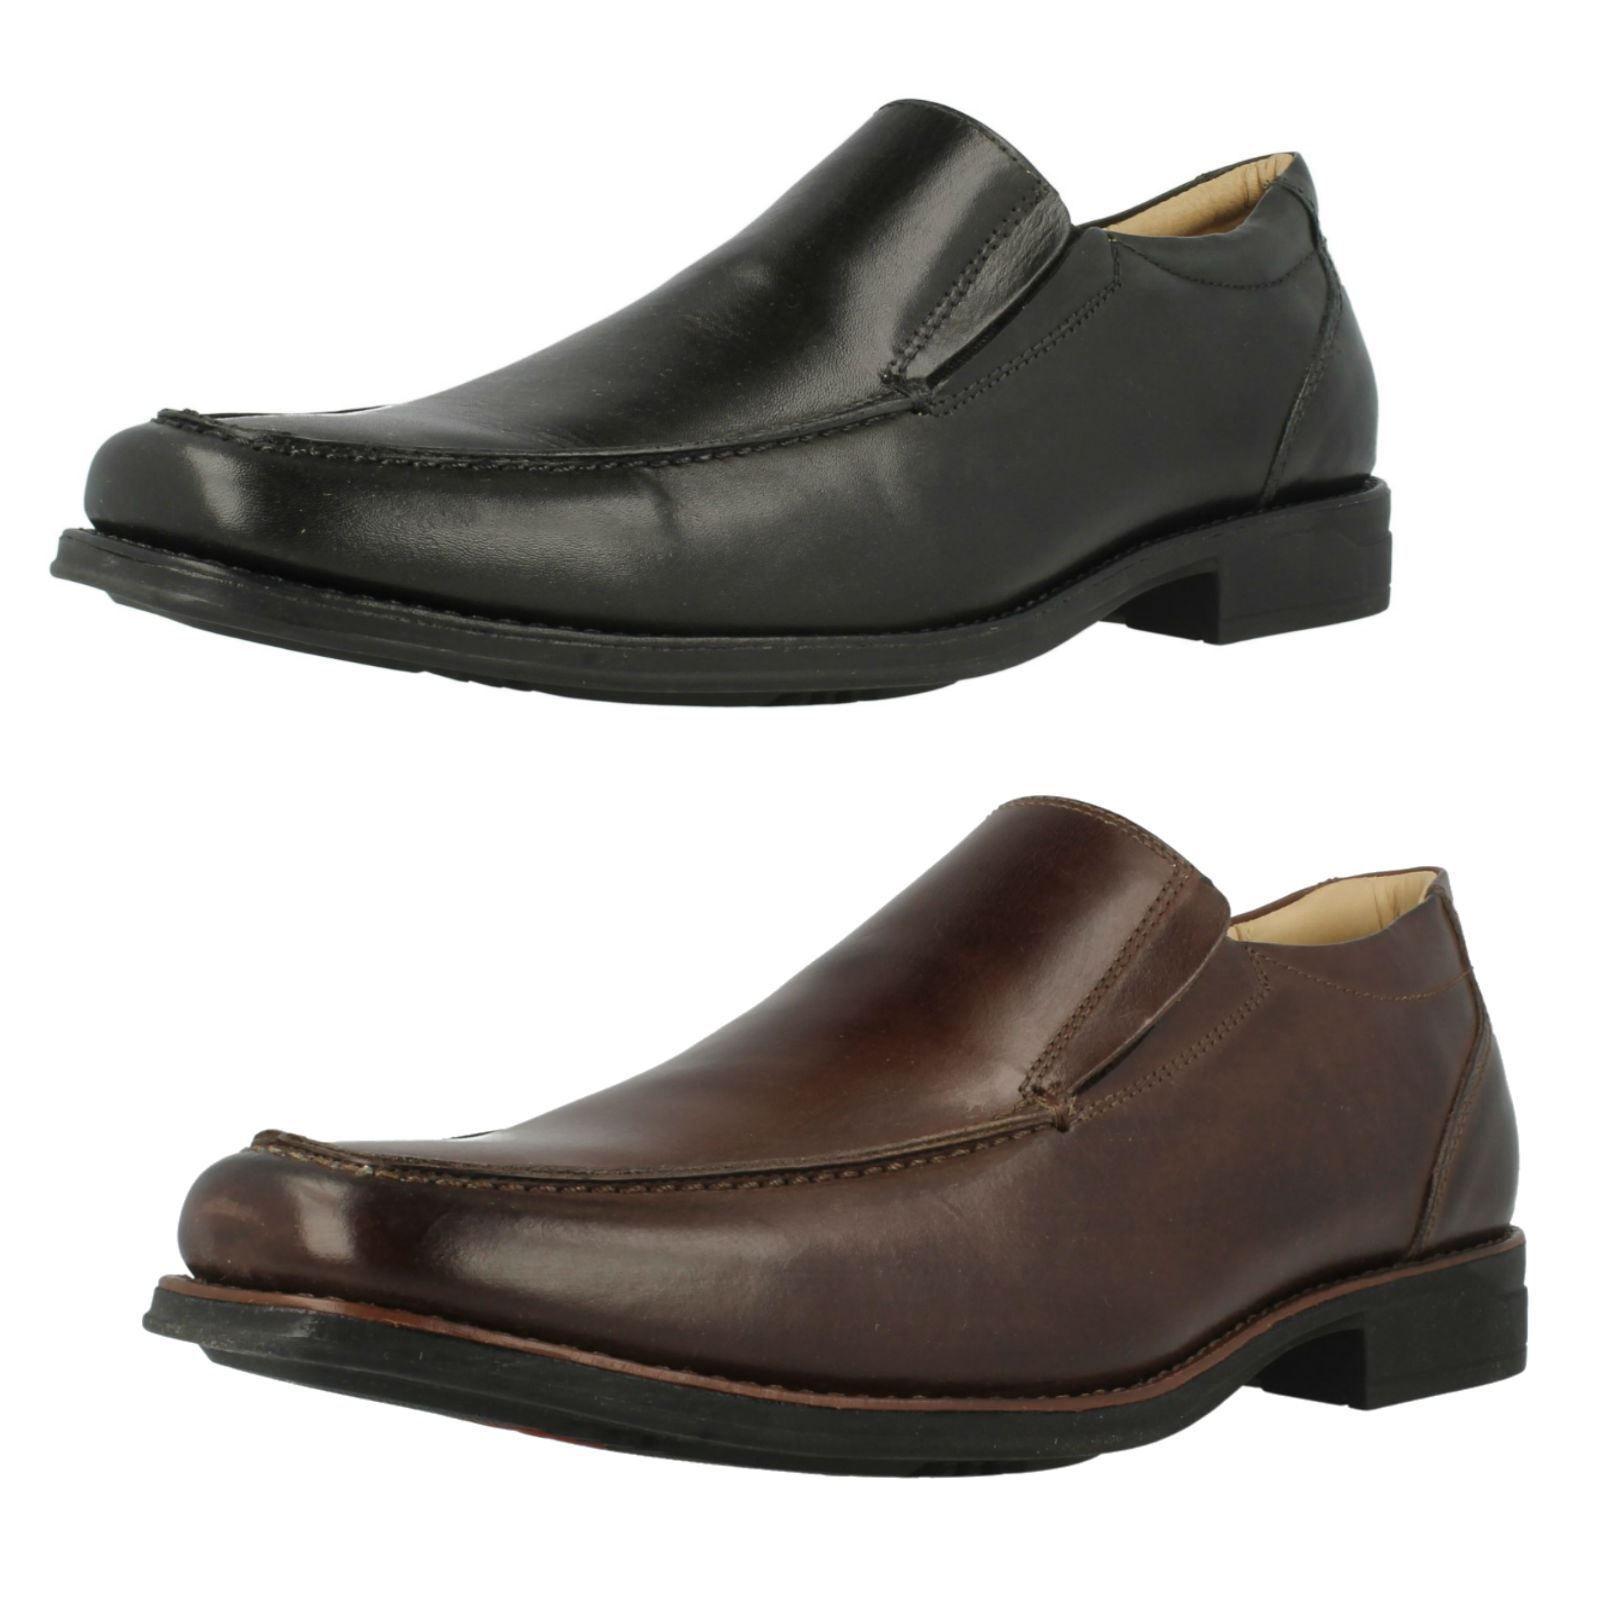 Herren Anatomic & Co Tapera schwarz oder Kaffee Leder Smart Slip On Schuhe